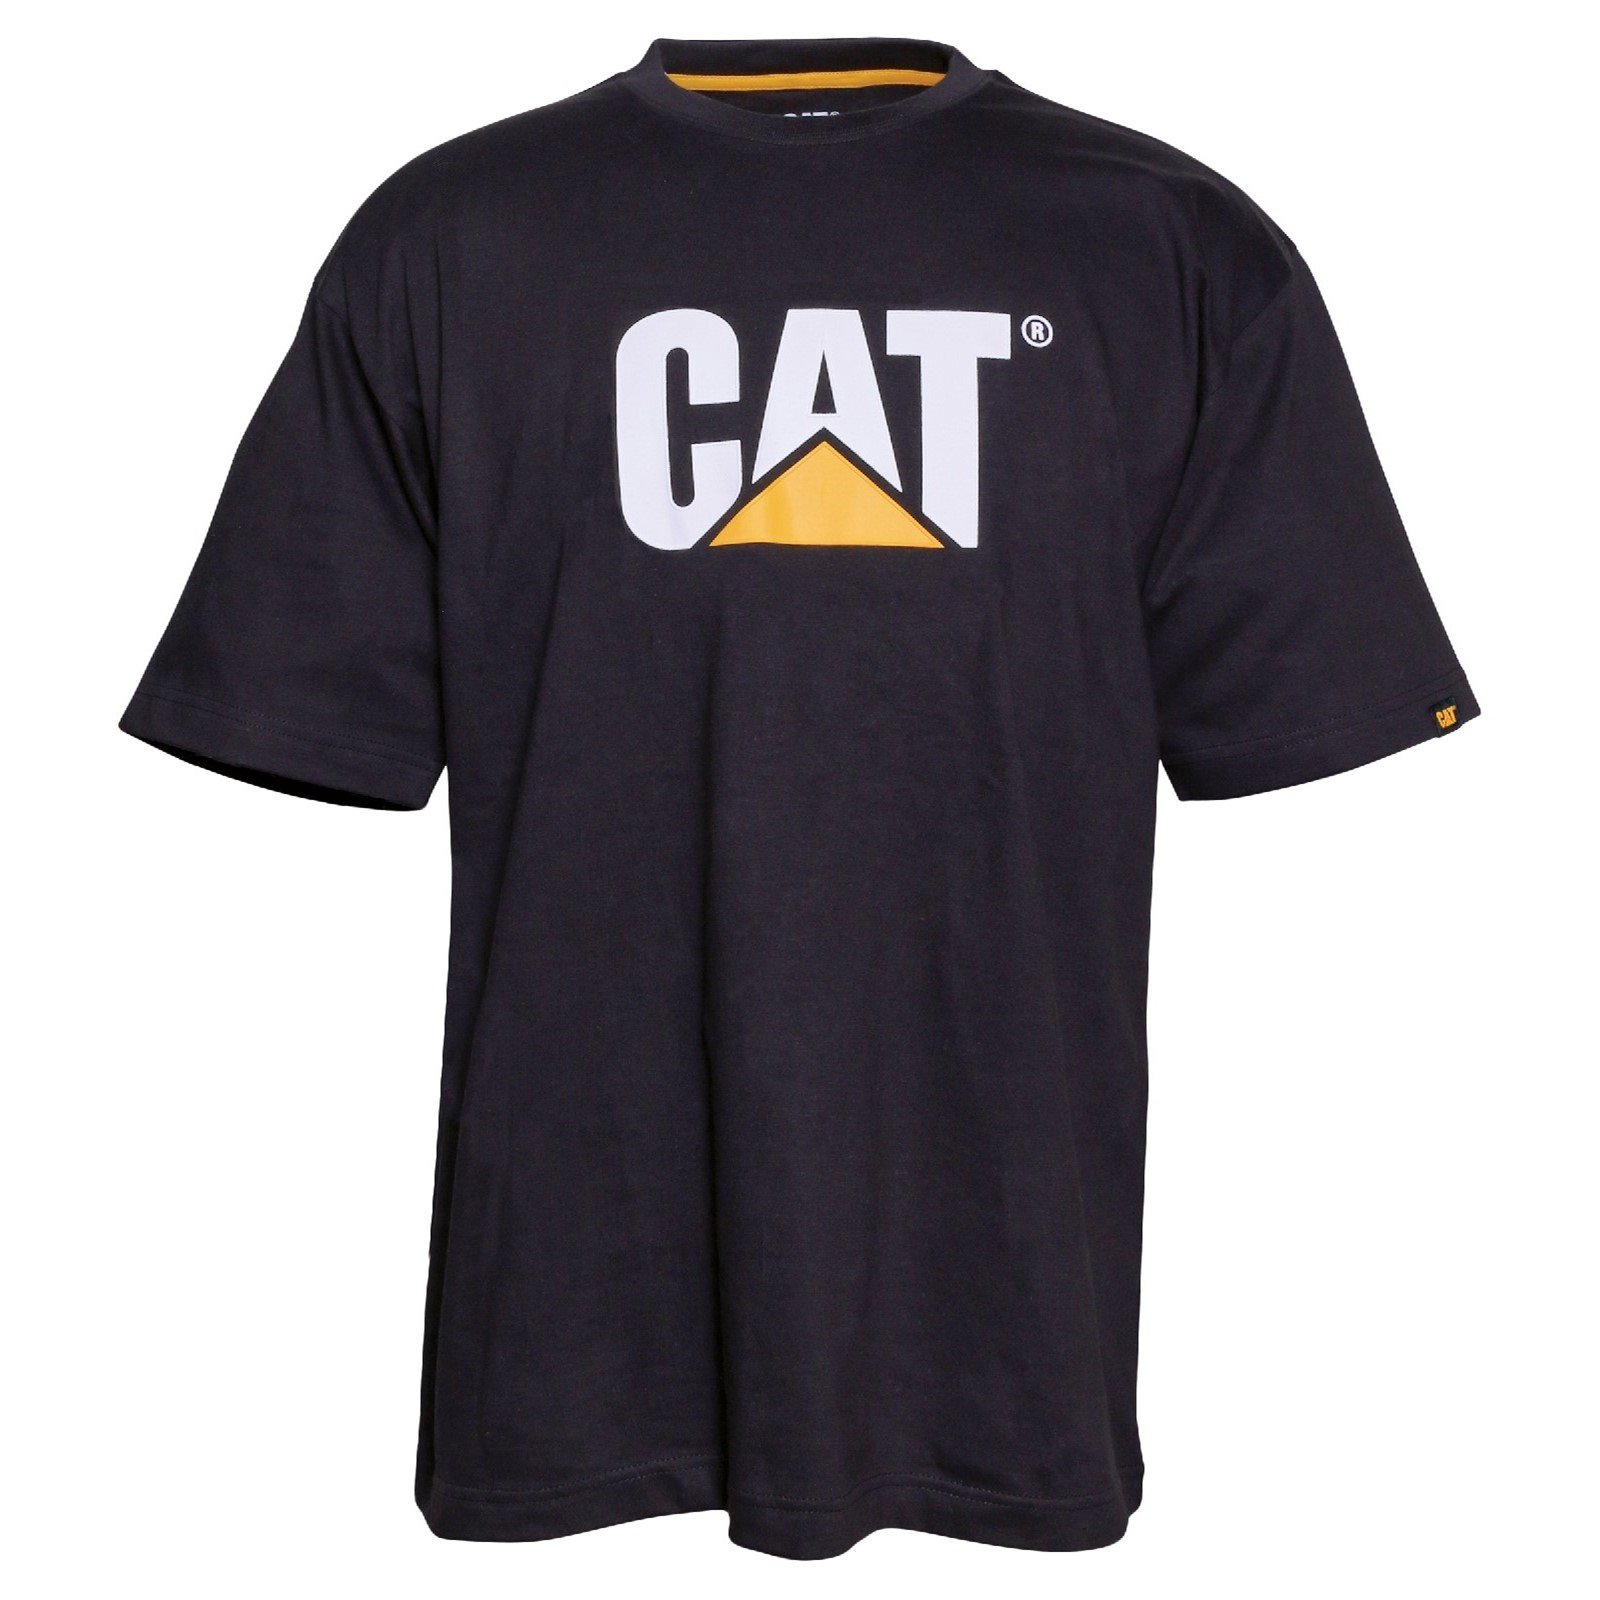 Caterpillar Men's Trademark Logo T-Shirt Various Colours 25301-42086 - Black Lge